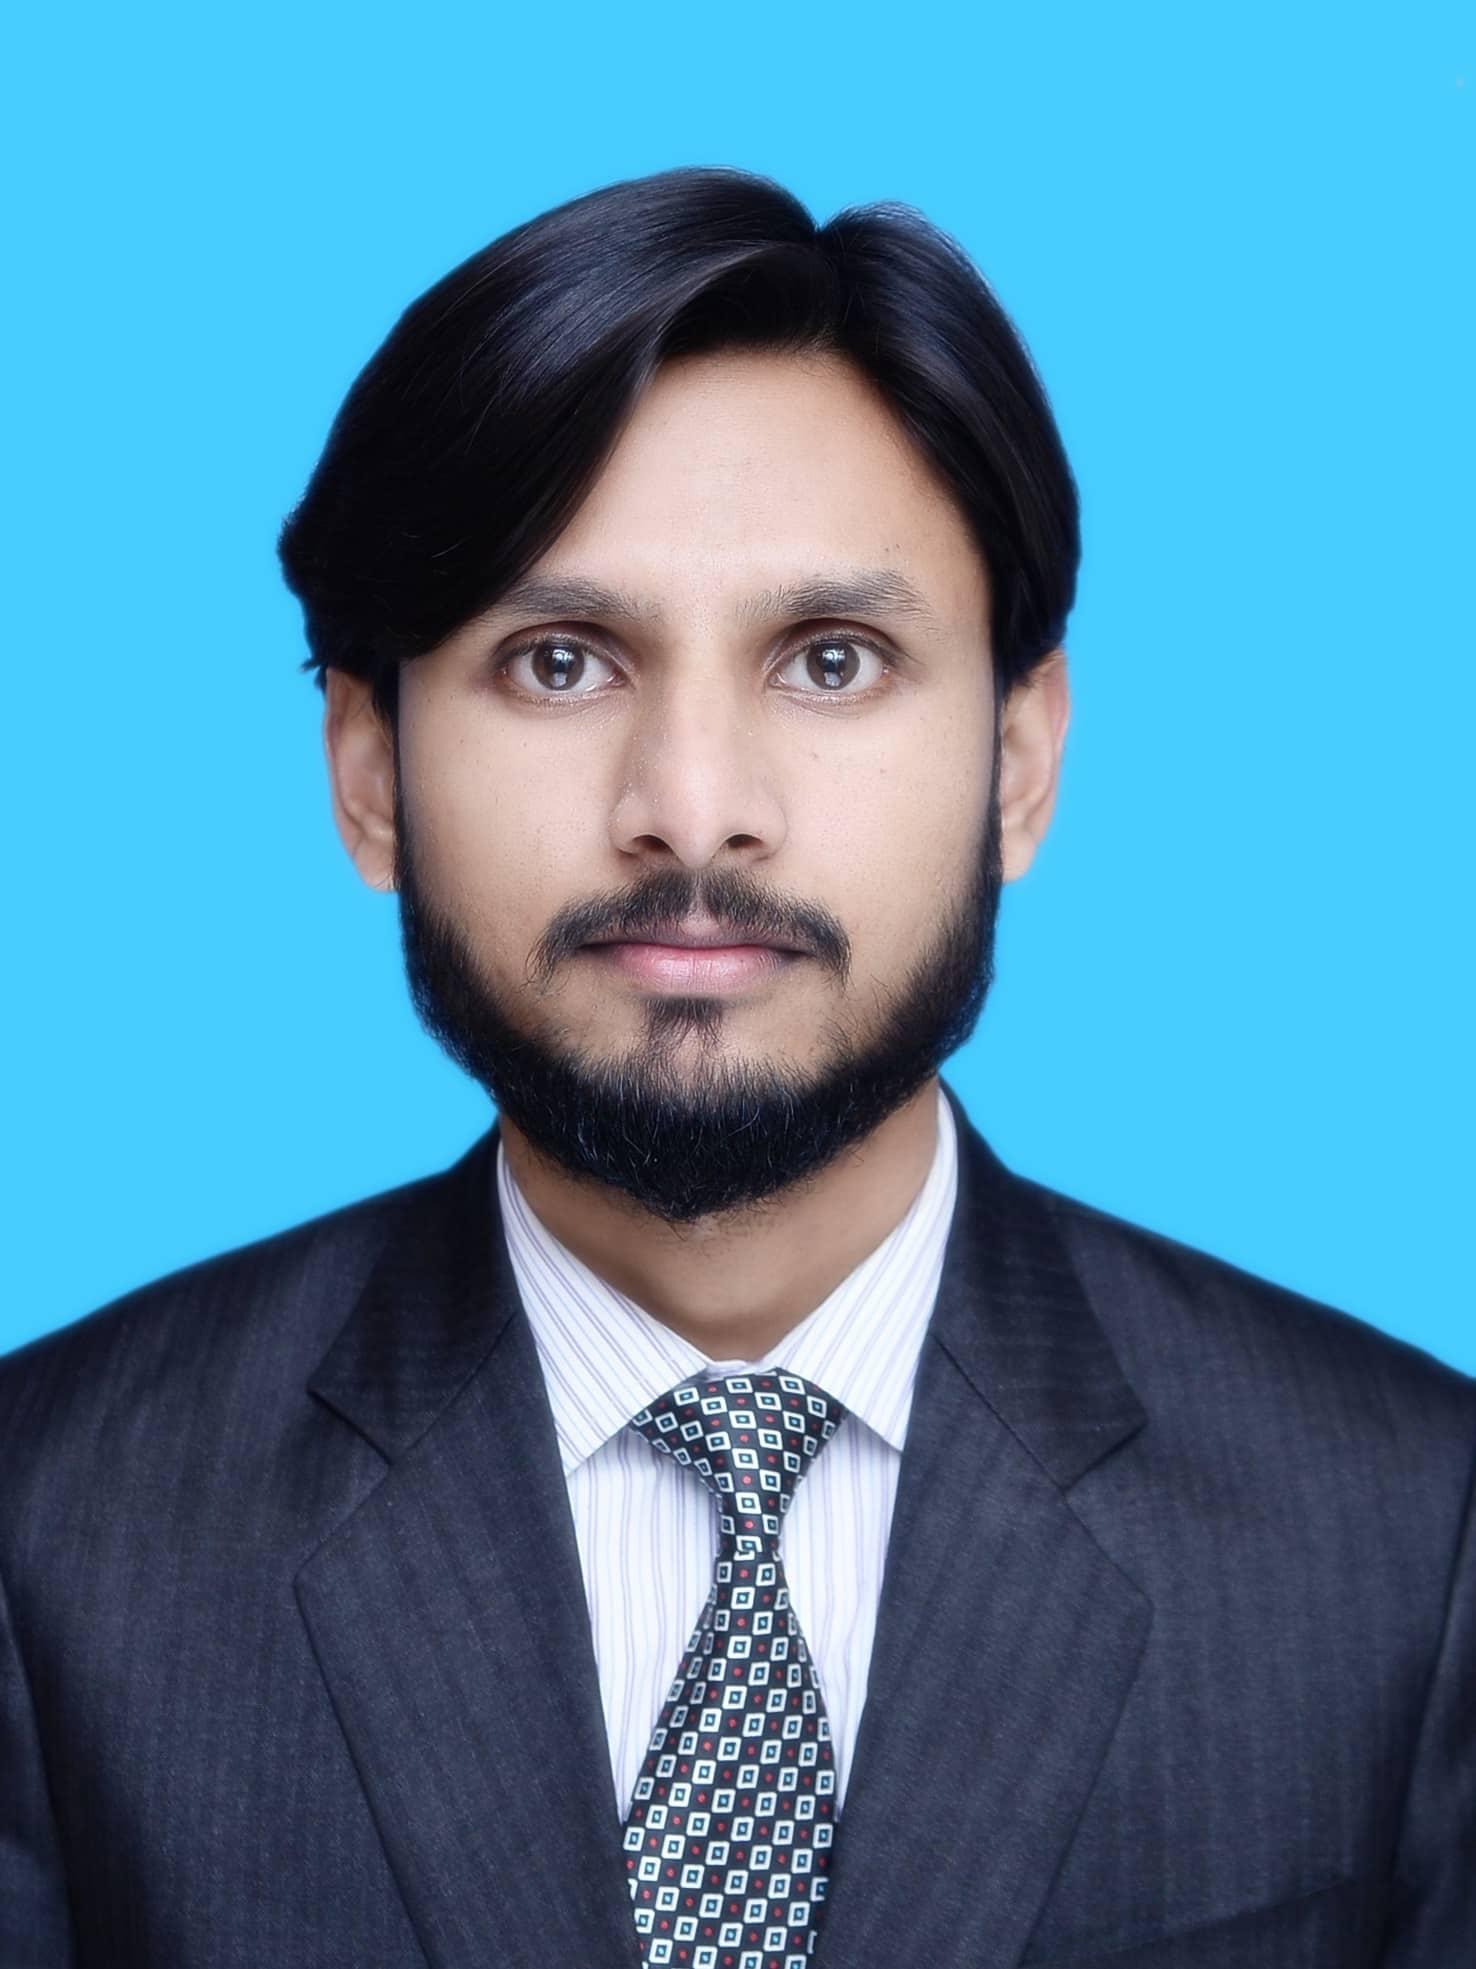 Mr. Afaq Javed